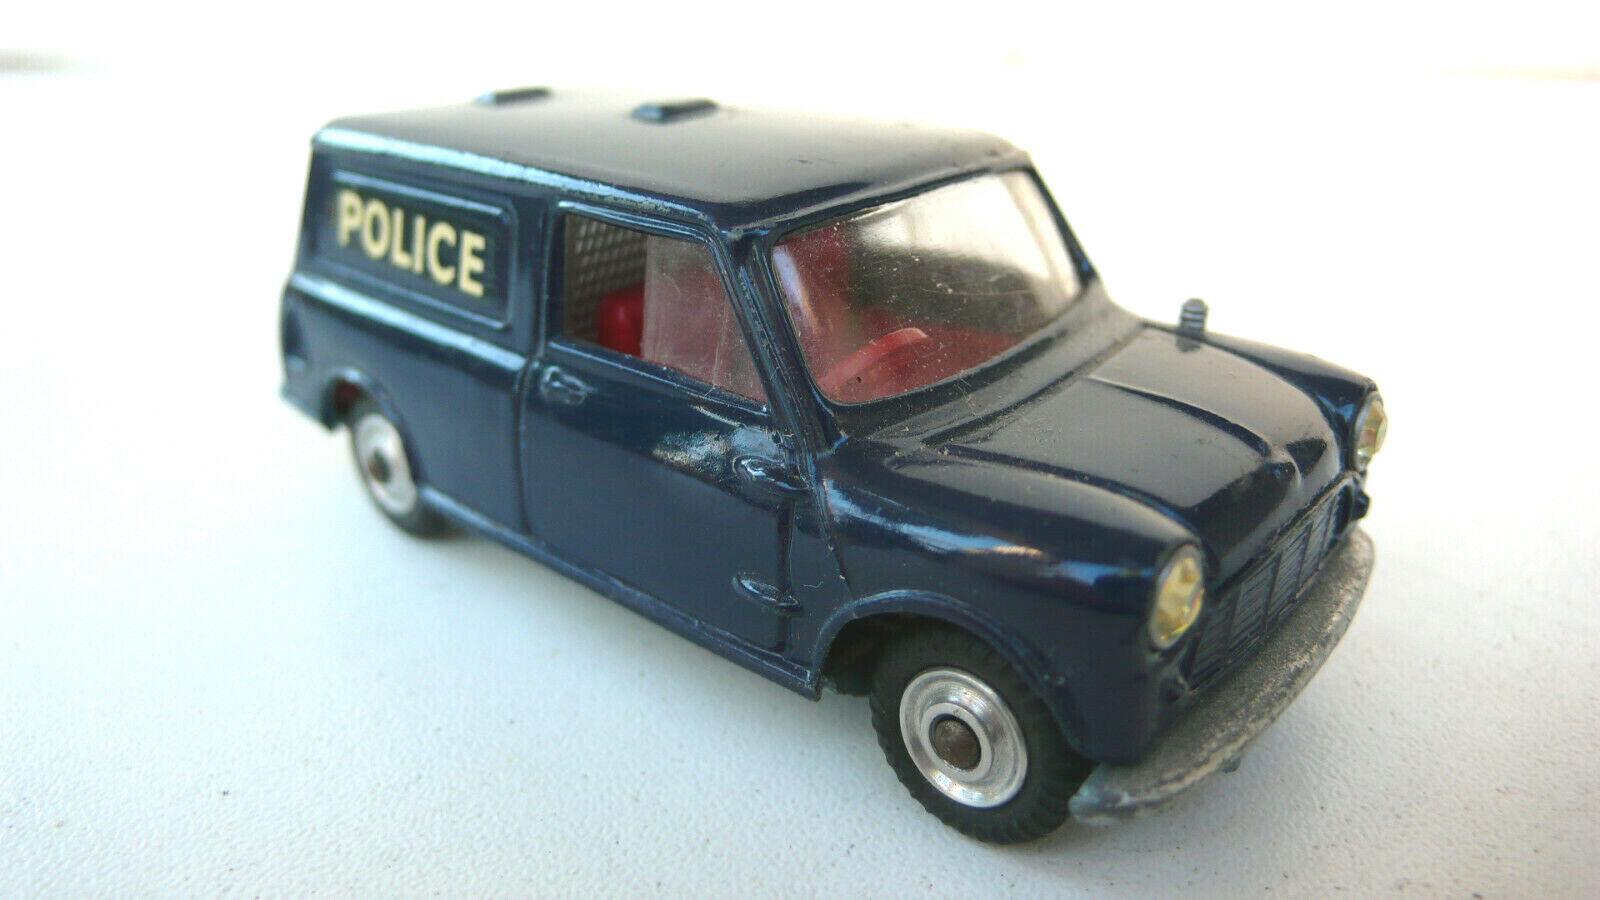 buen precio CORGI TOYS TOYS TOYS     AUSTIN  MINI VAN POLICE    REF 448       TRÈS BON ÉTAT  para proporcionarle una compra en línea agradable